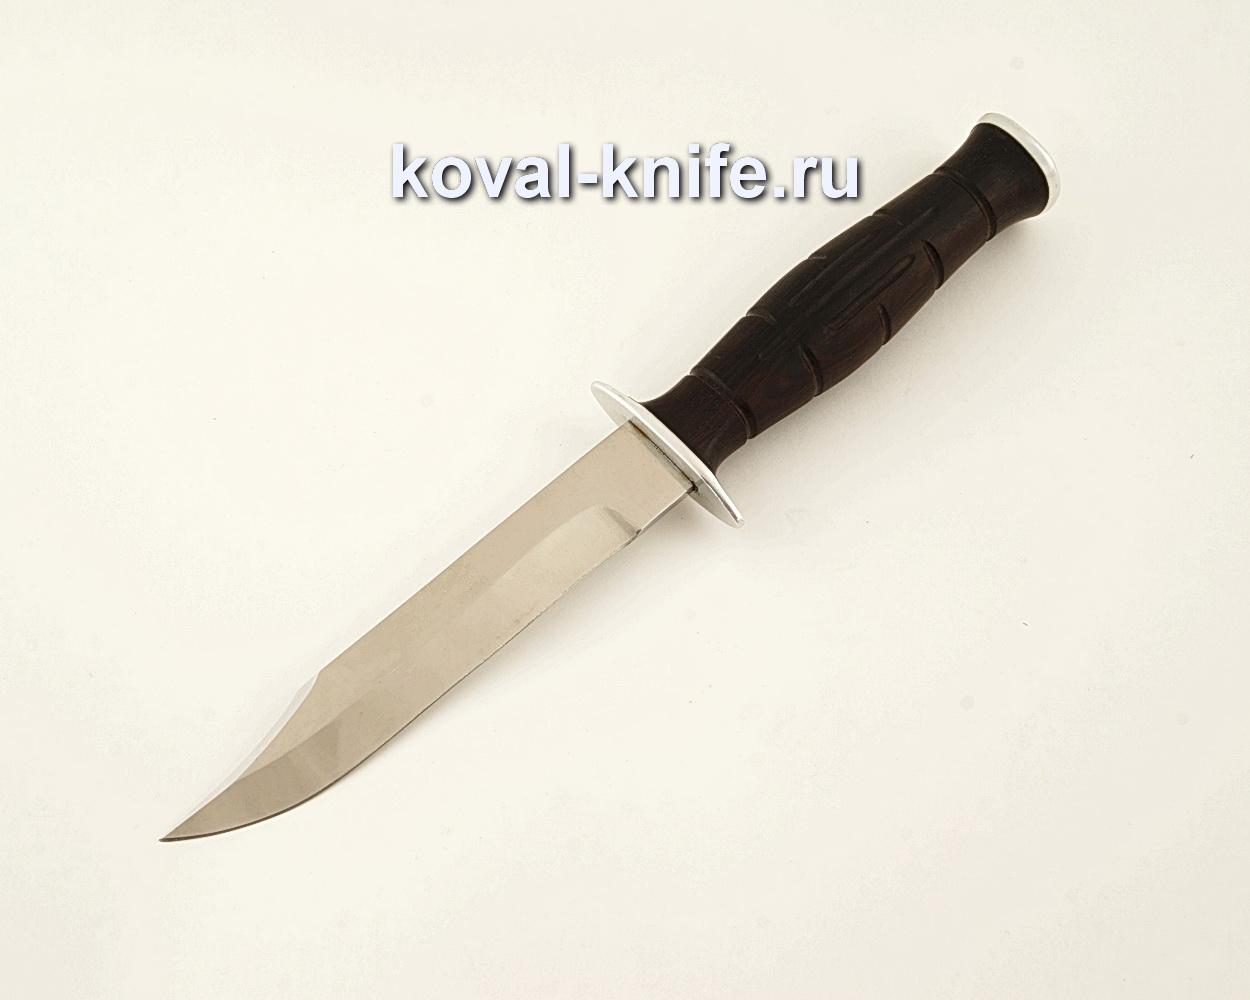 Нож Вишня из кованой стали 95Х18 с рукоятью из граба  A618